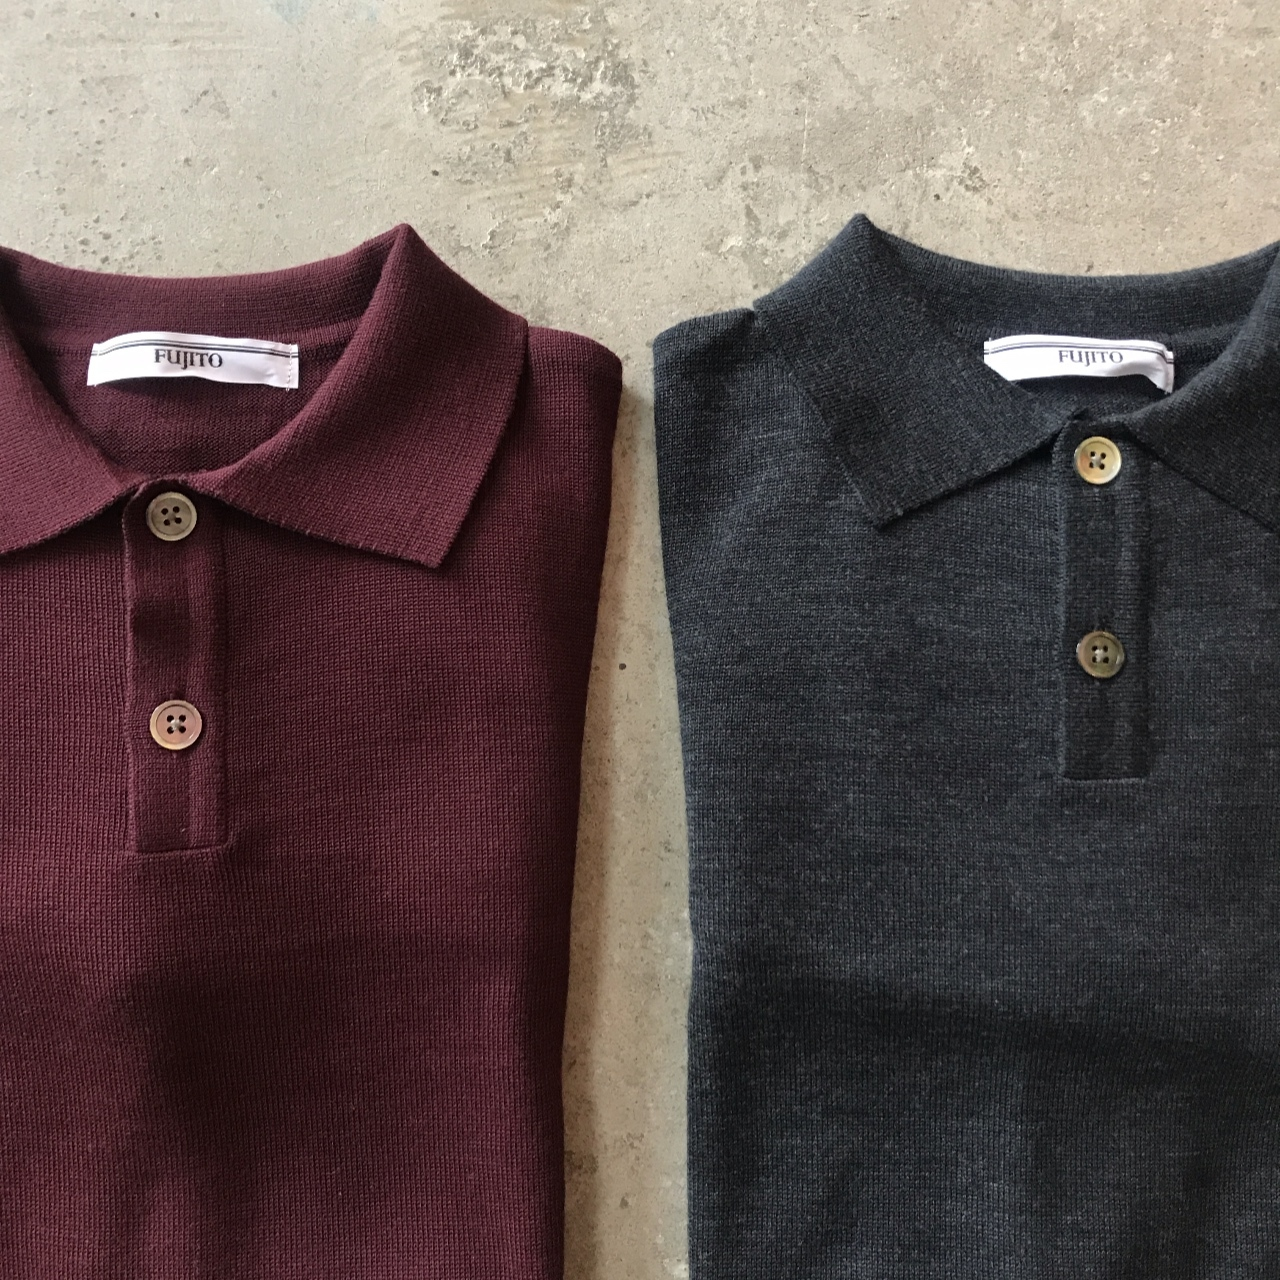 FUJITO - L/S Knit Polo Shirt